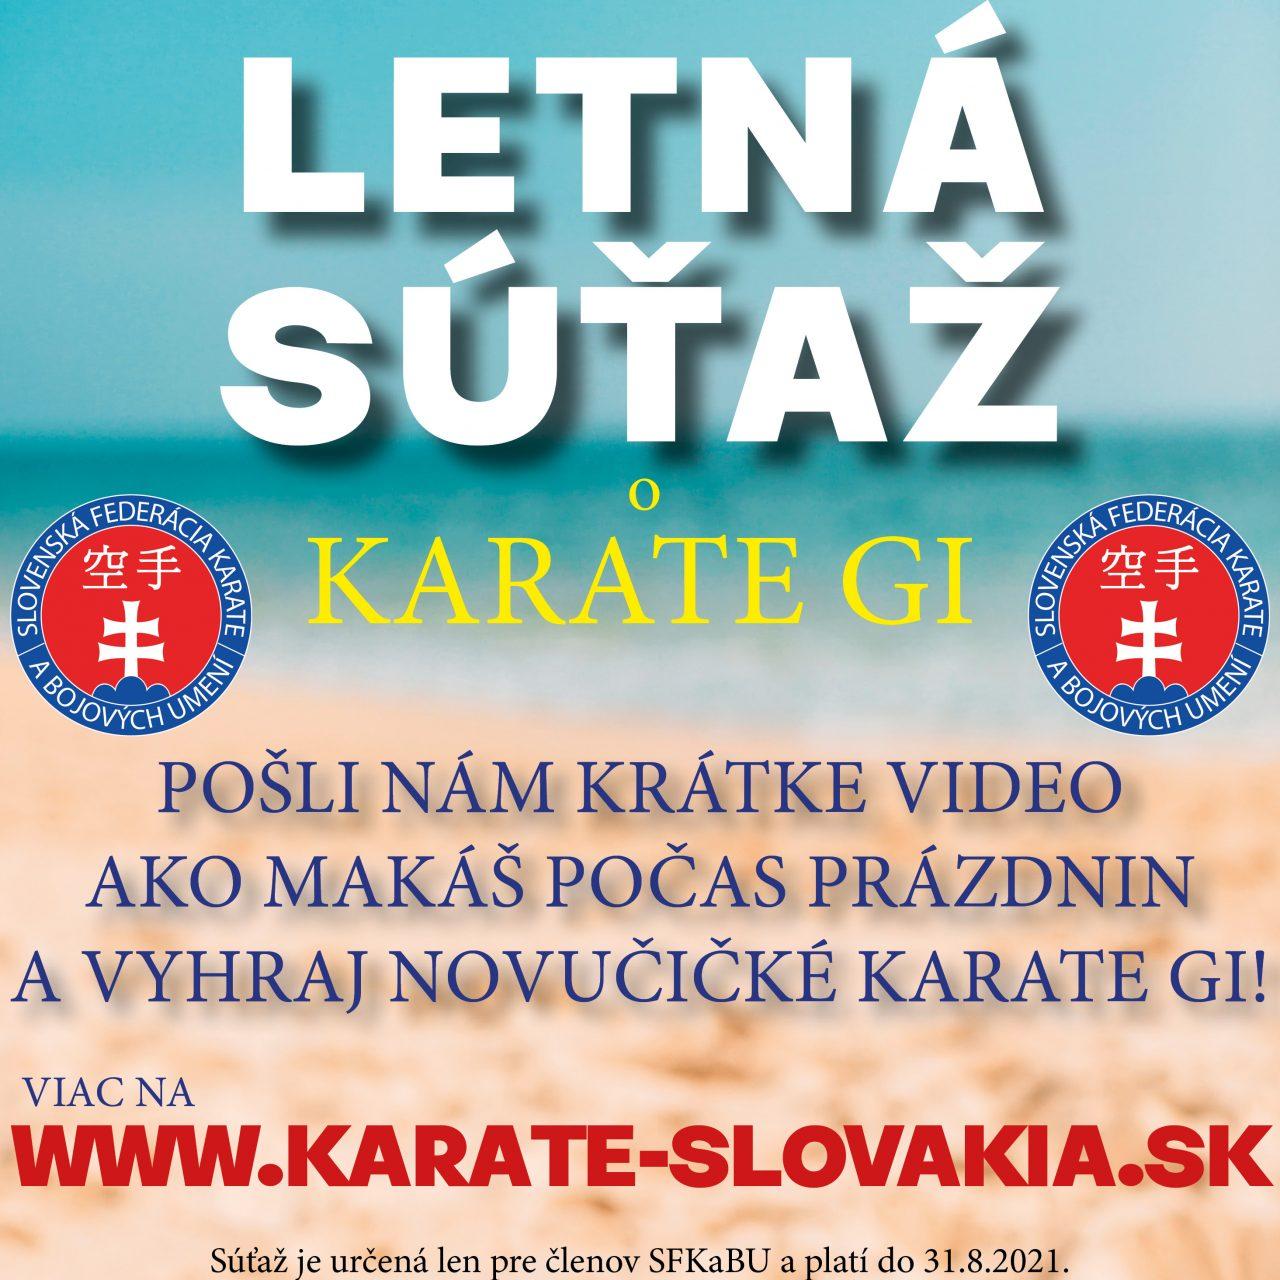 https://karate-slovakia.sk/wp-content/uploads/letna-sutaz-FB-1280x1280.jpg